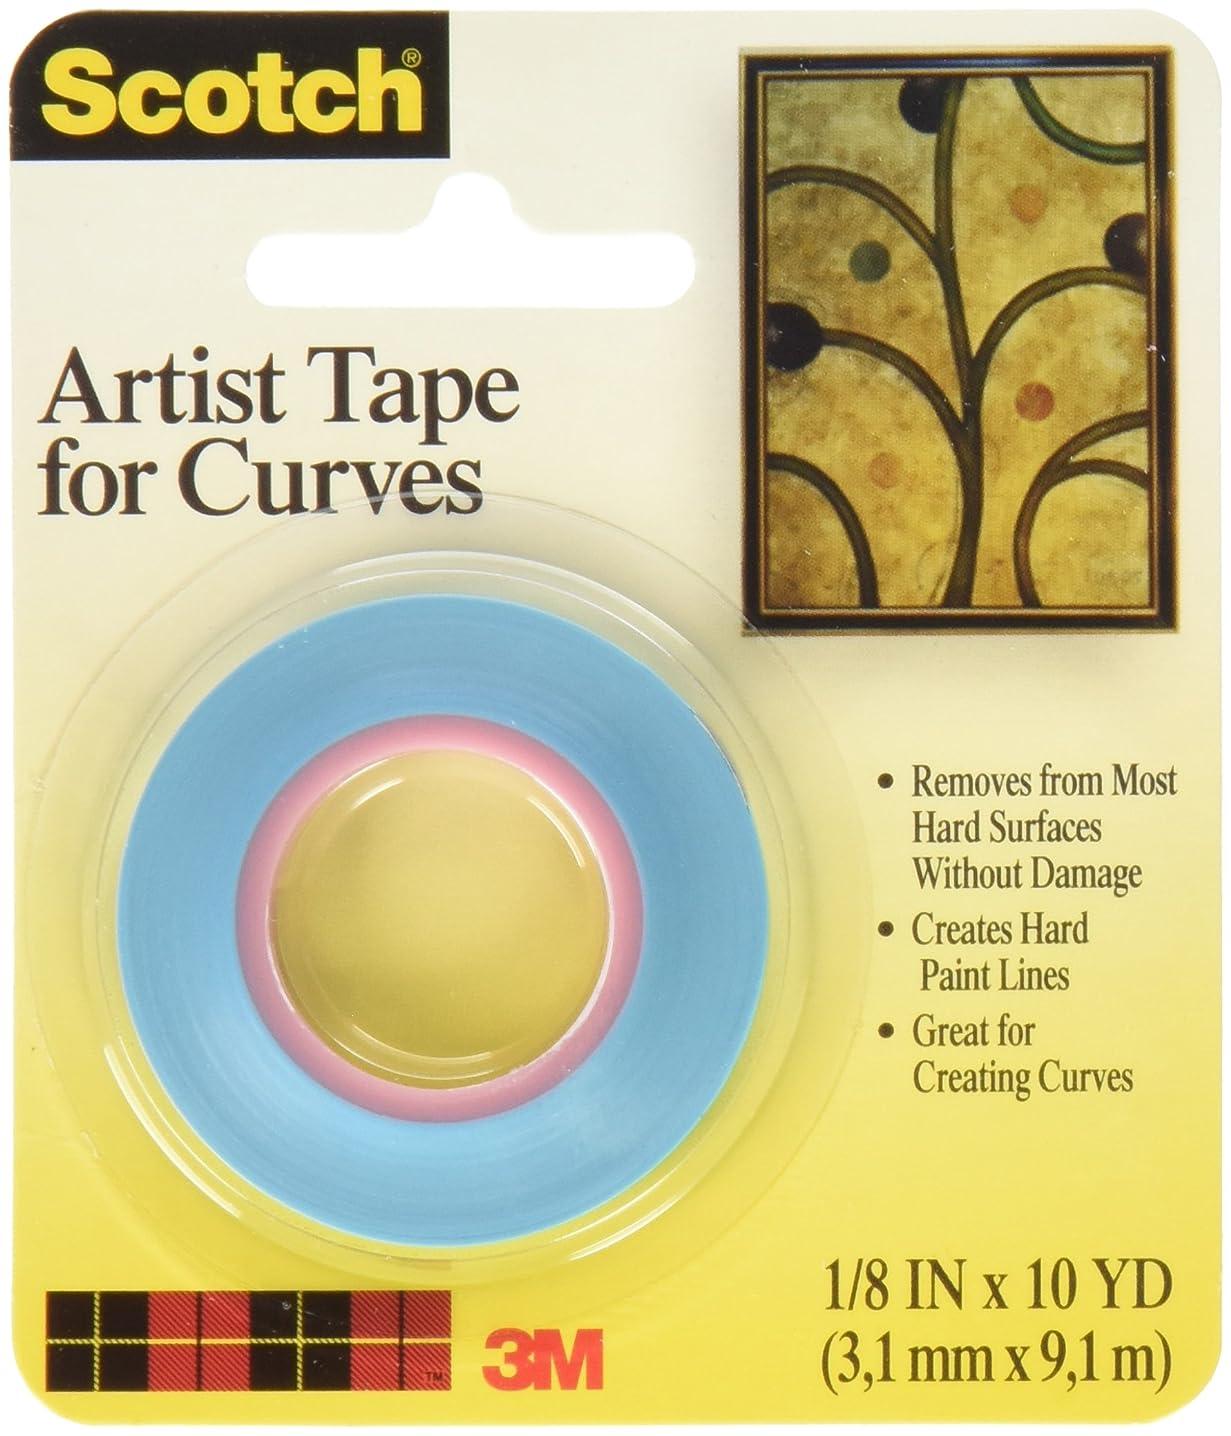 Bulk Buy: 3M Scotch Artist Tape For Curves 1/8